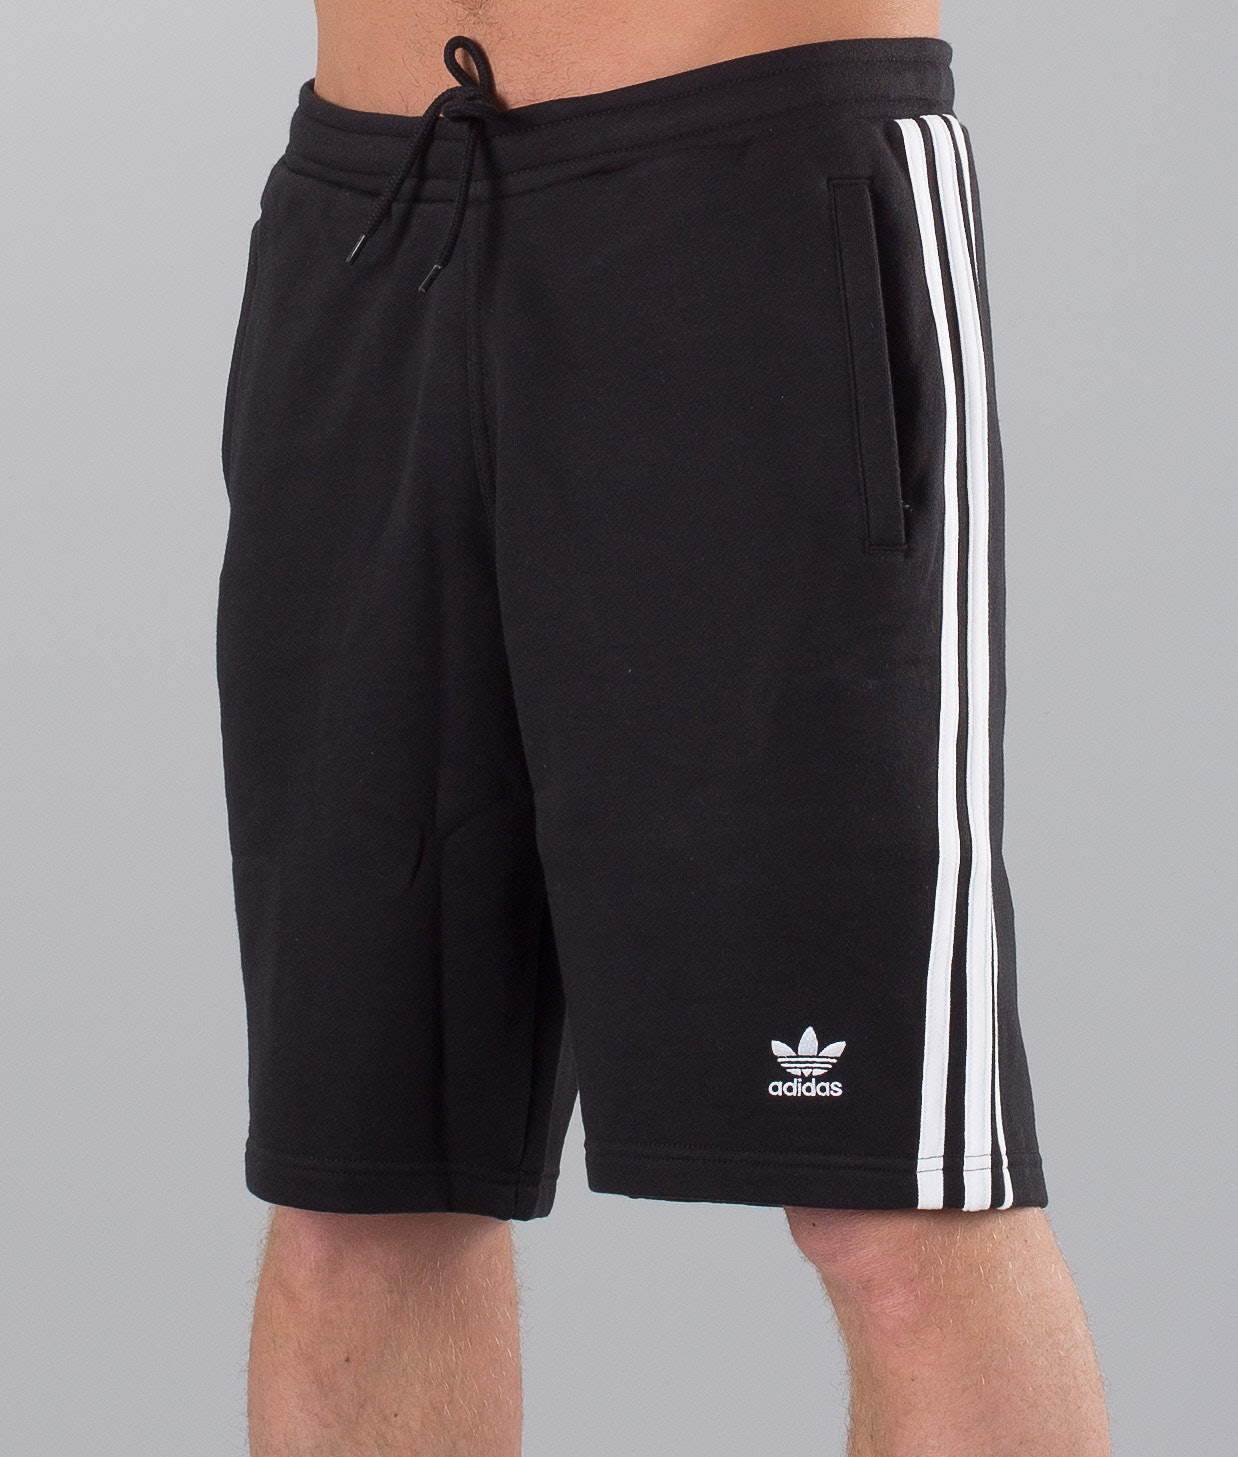 new product c4eb2 599c2 Adidas Originals 3-Stripes Shorts